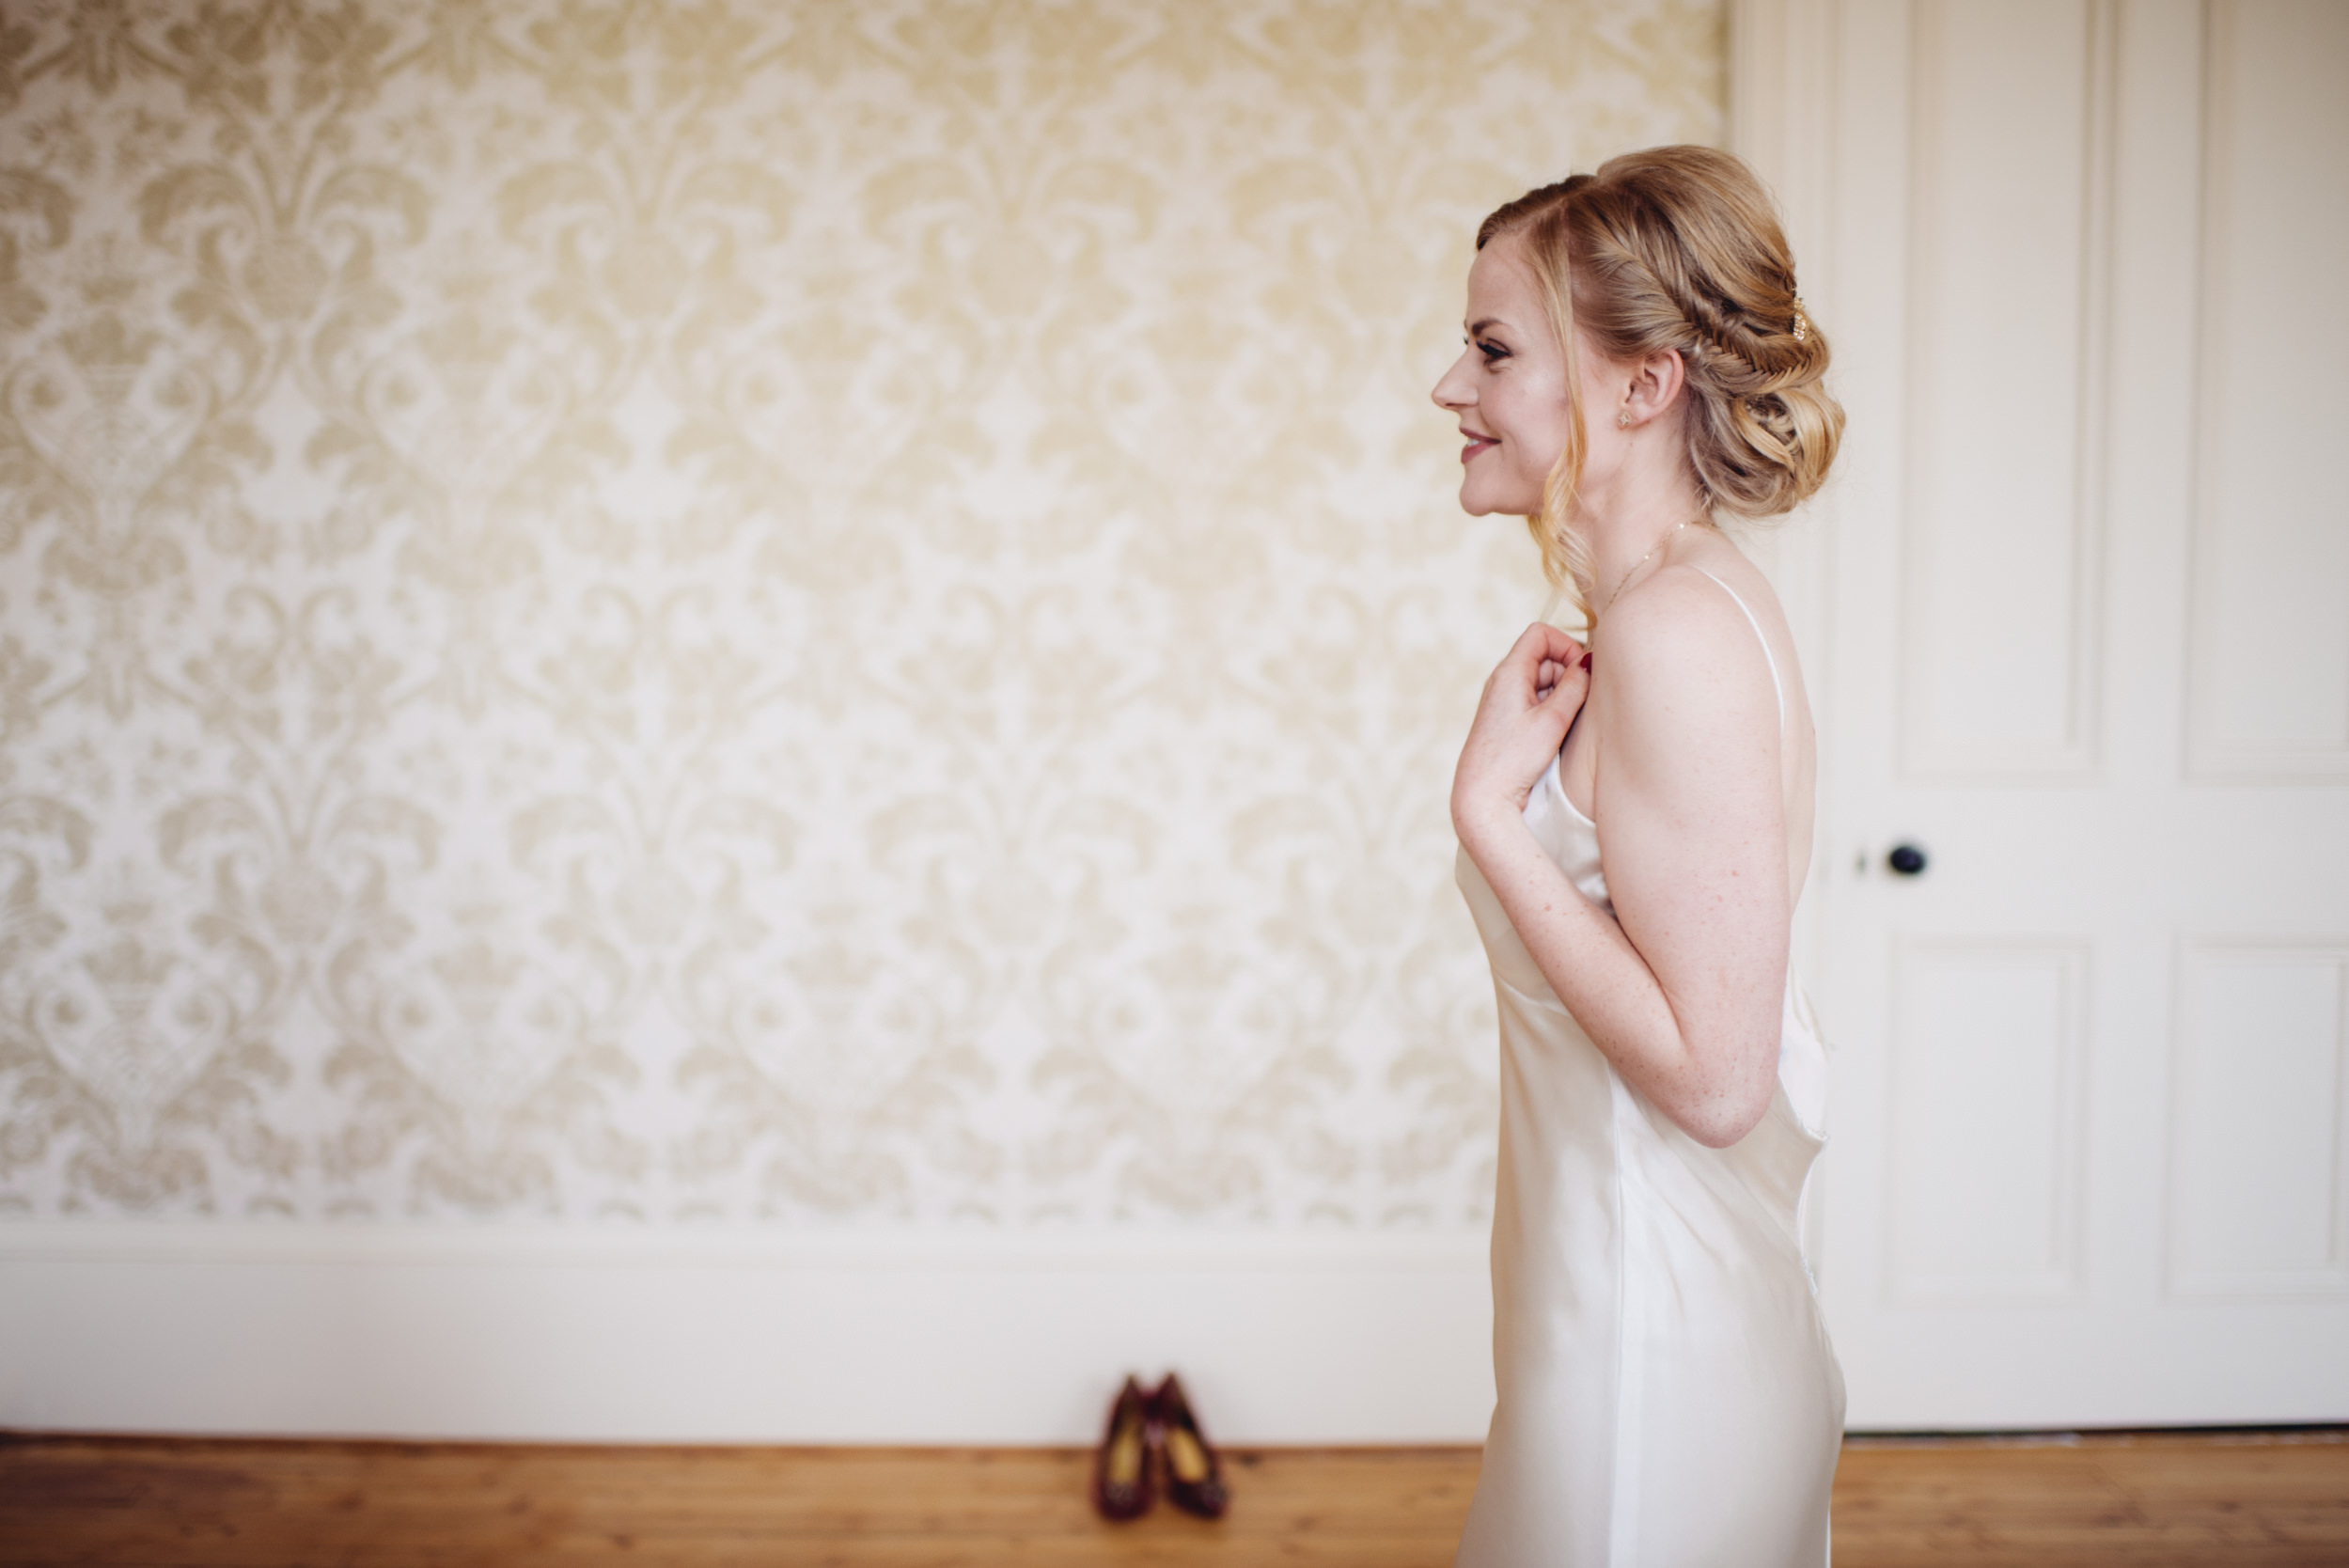 0177-alternative-wedding-portrait-family-kids-photographer-glasgow-scotland.JPG